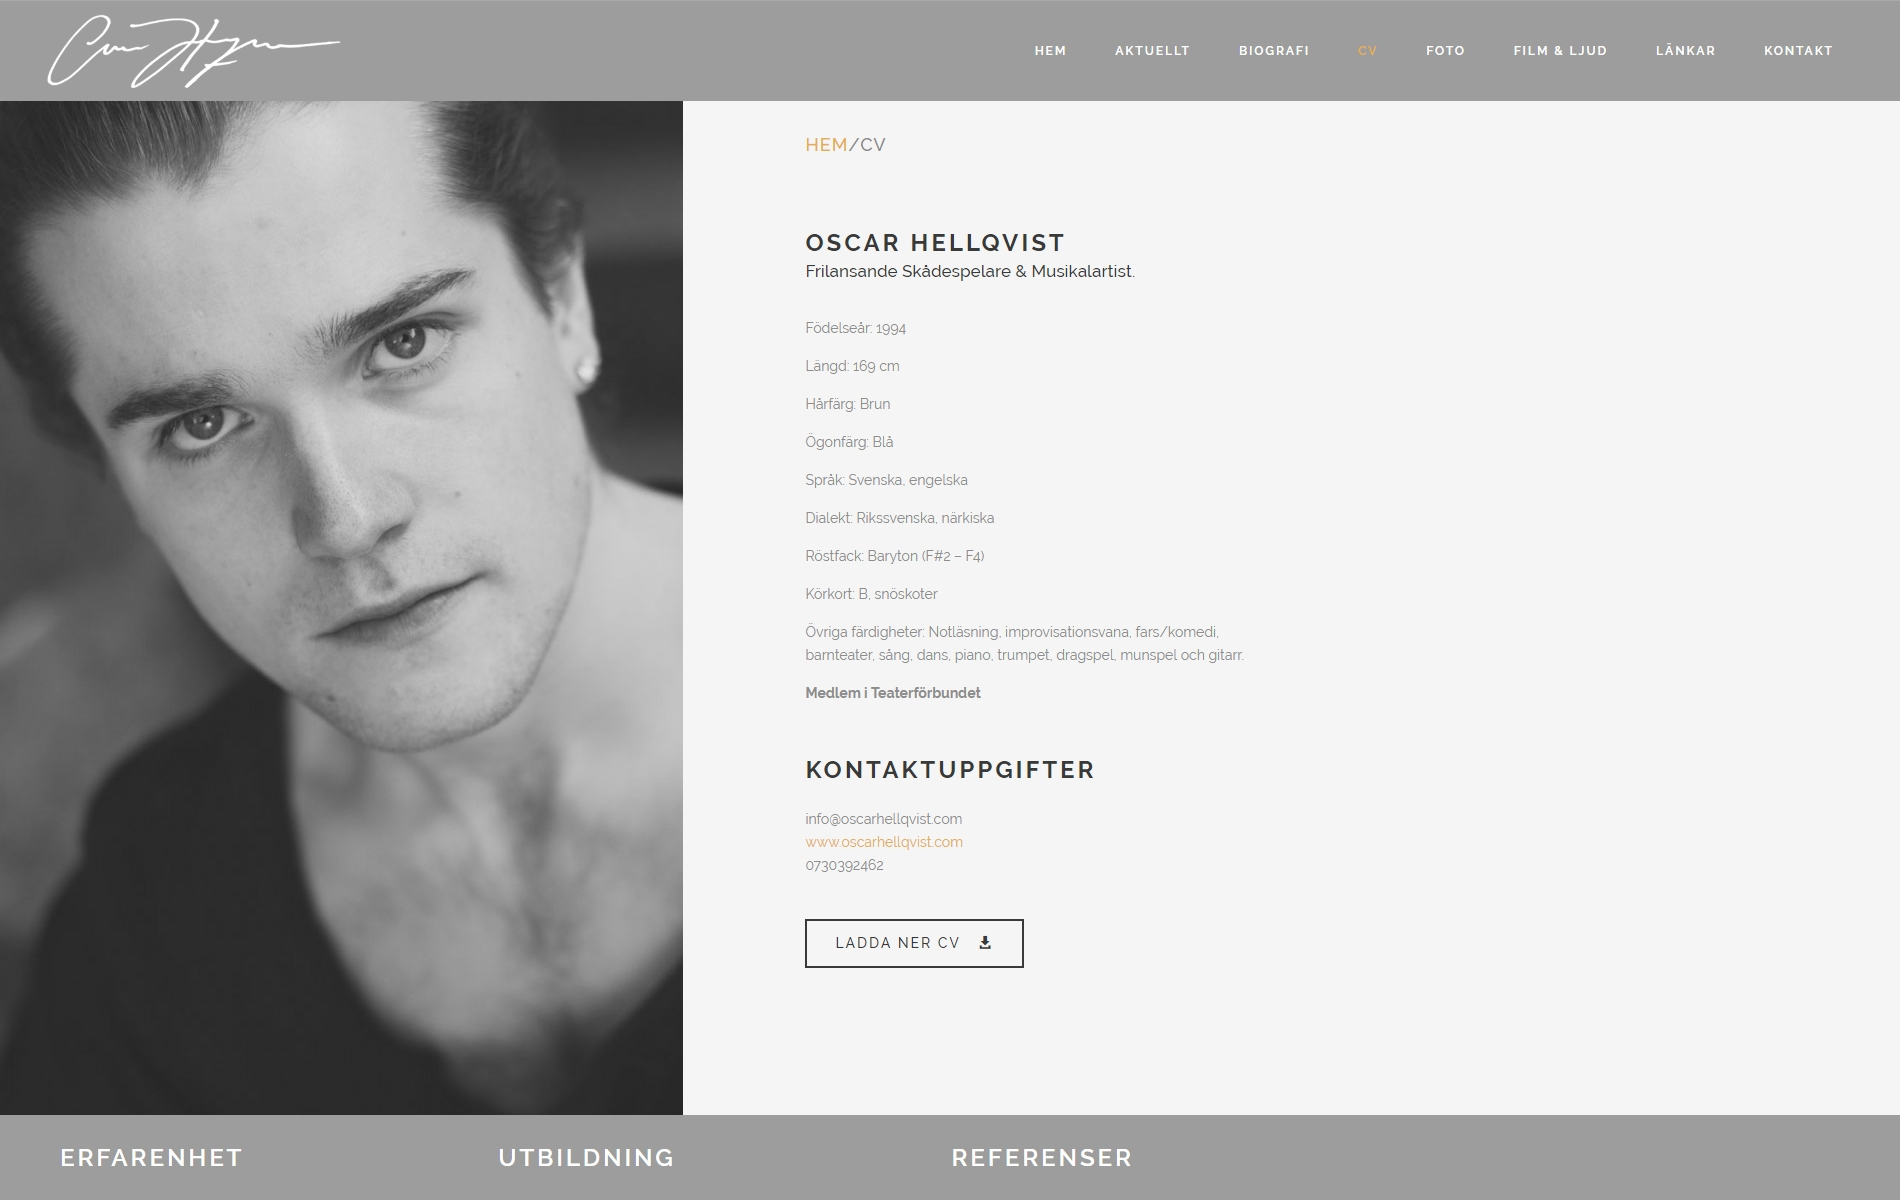 Web Design anweb Oscar Hellqvist